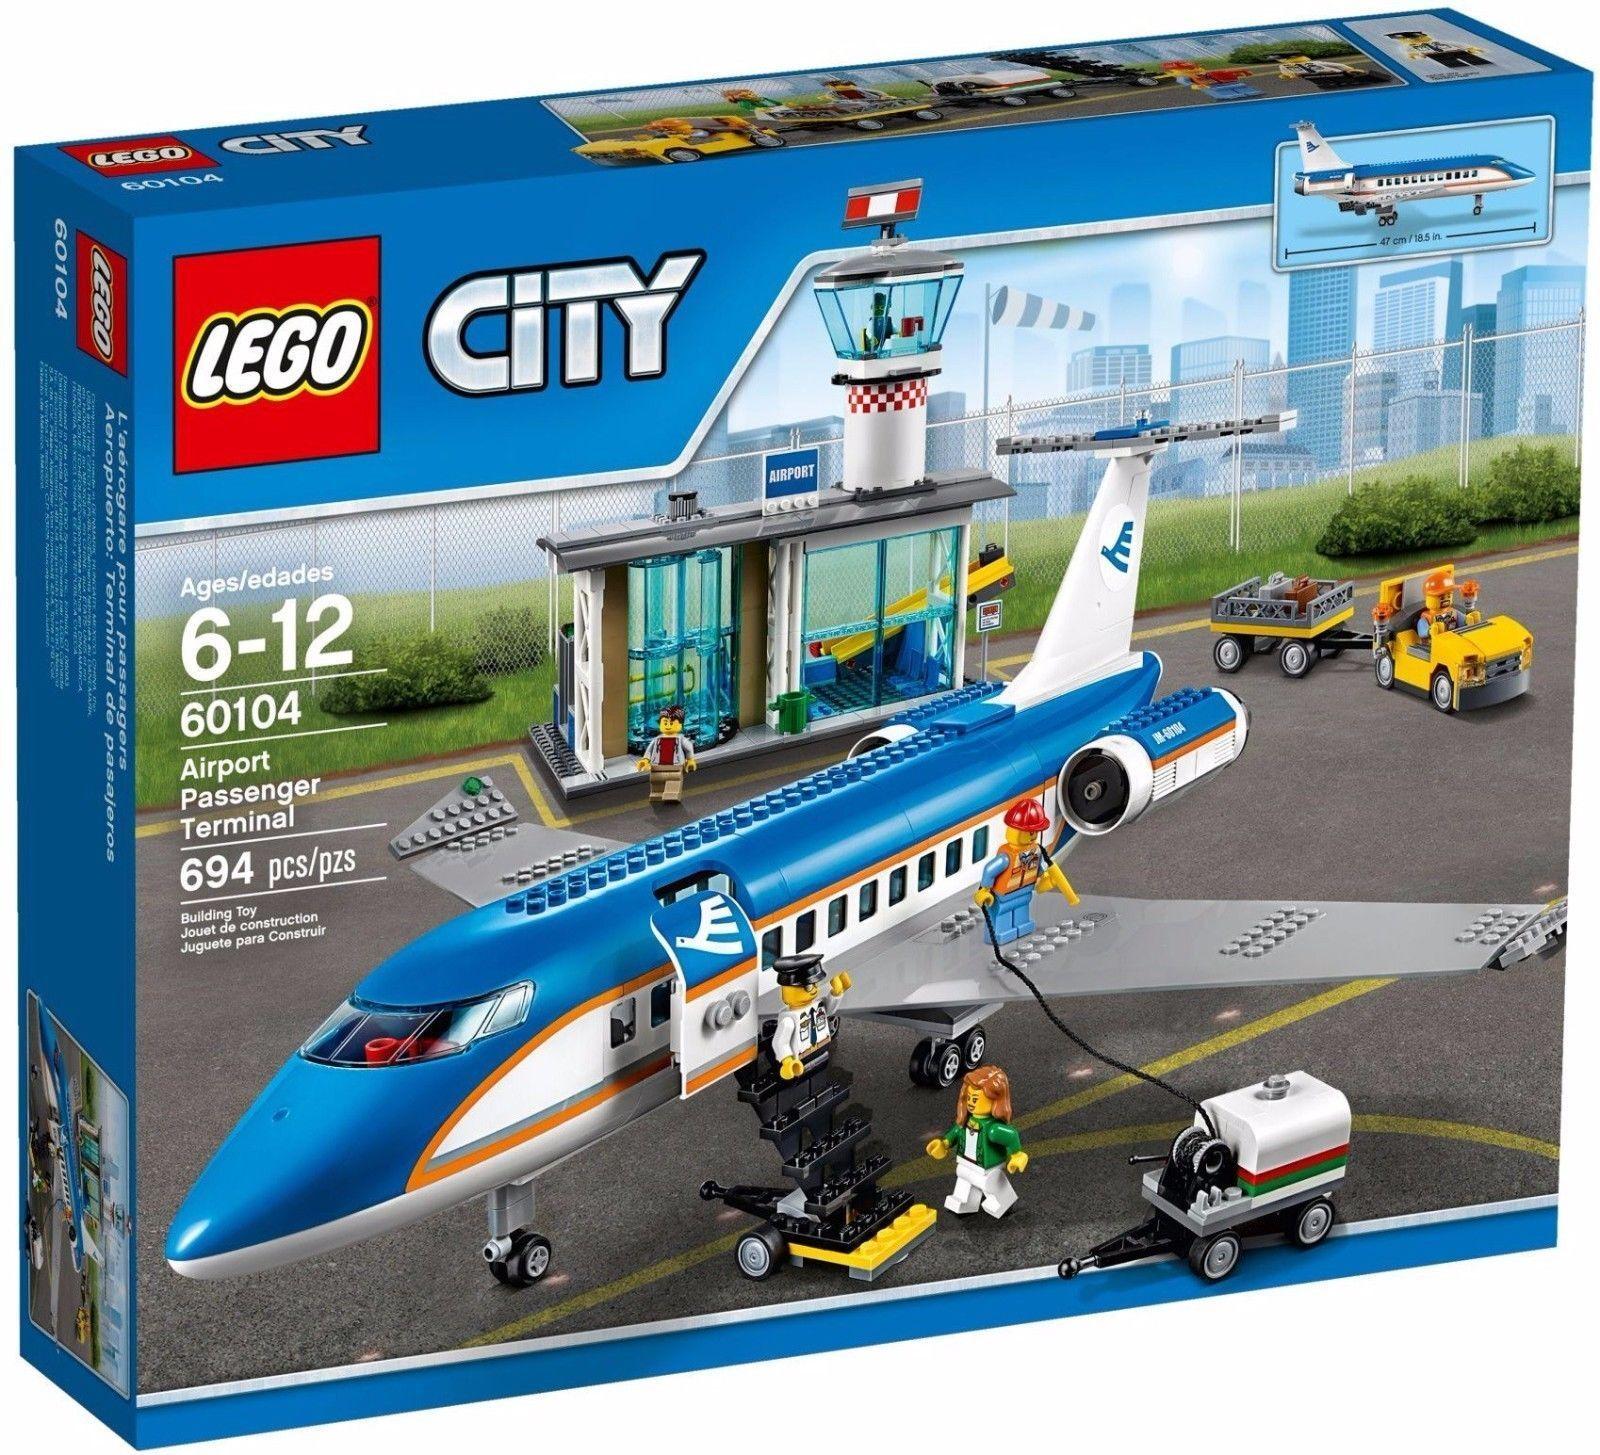 LEGO 60104 CITY Airport Passenger Terminal NEW